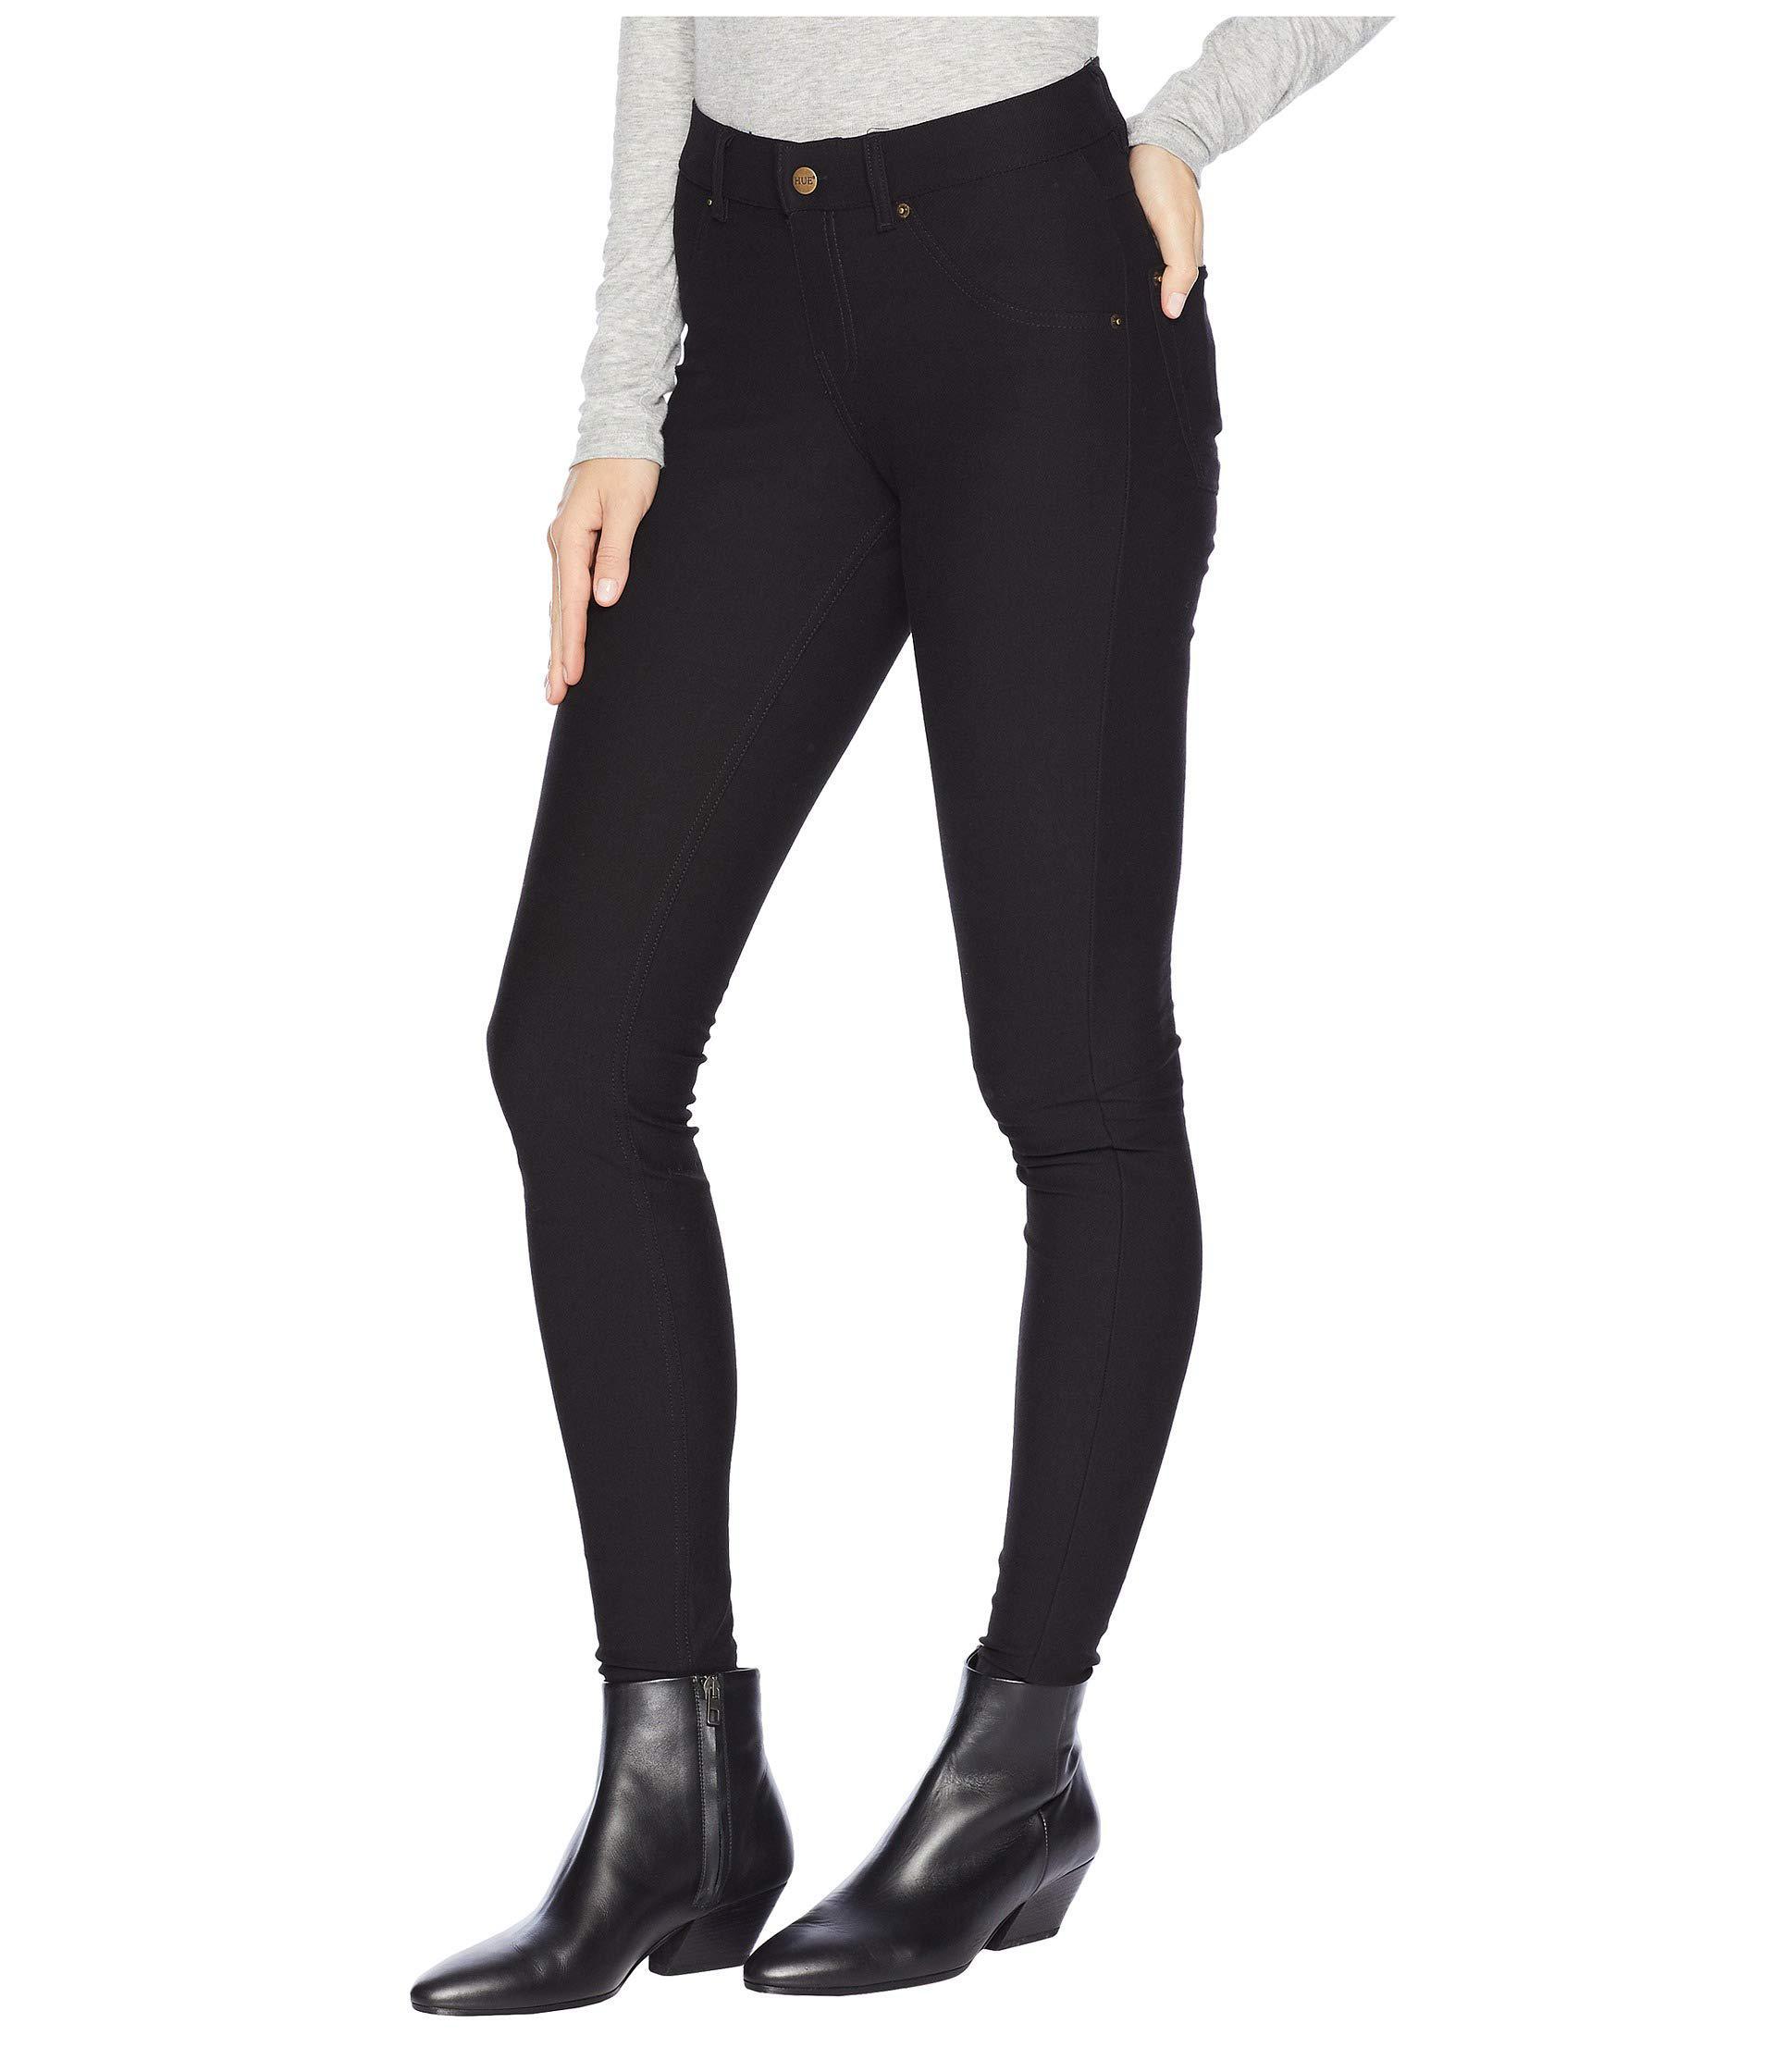 87ec65407f4d4 Lyst - Hue Essential Denim Leggings (black) Women's Jeans in Black